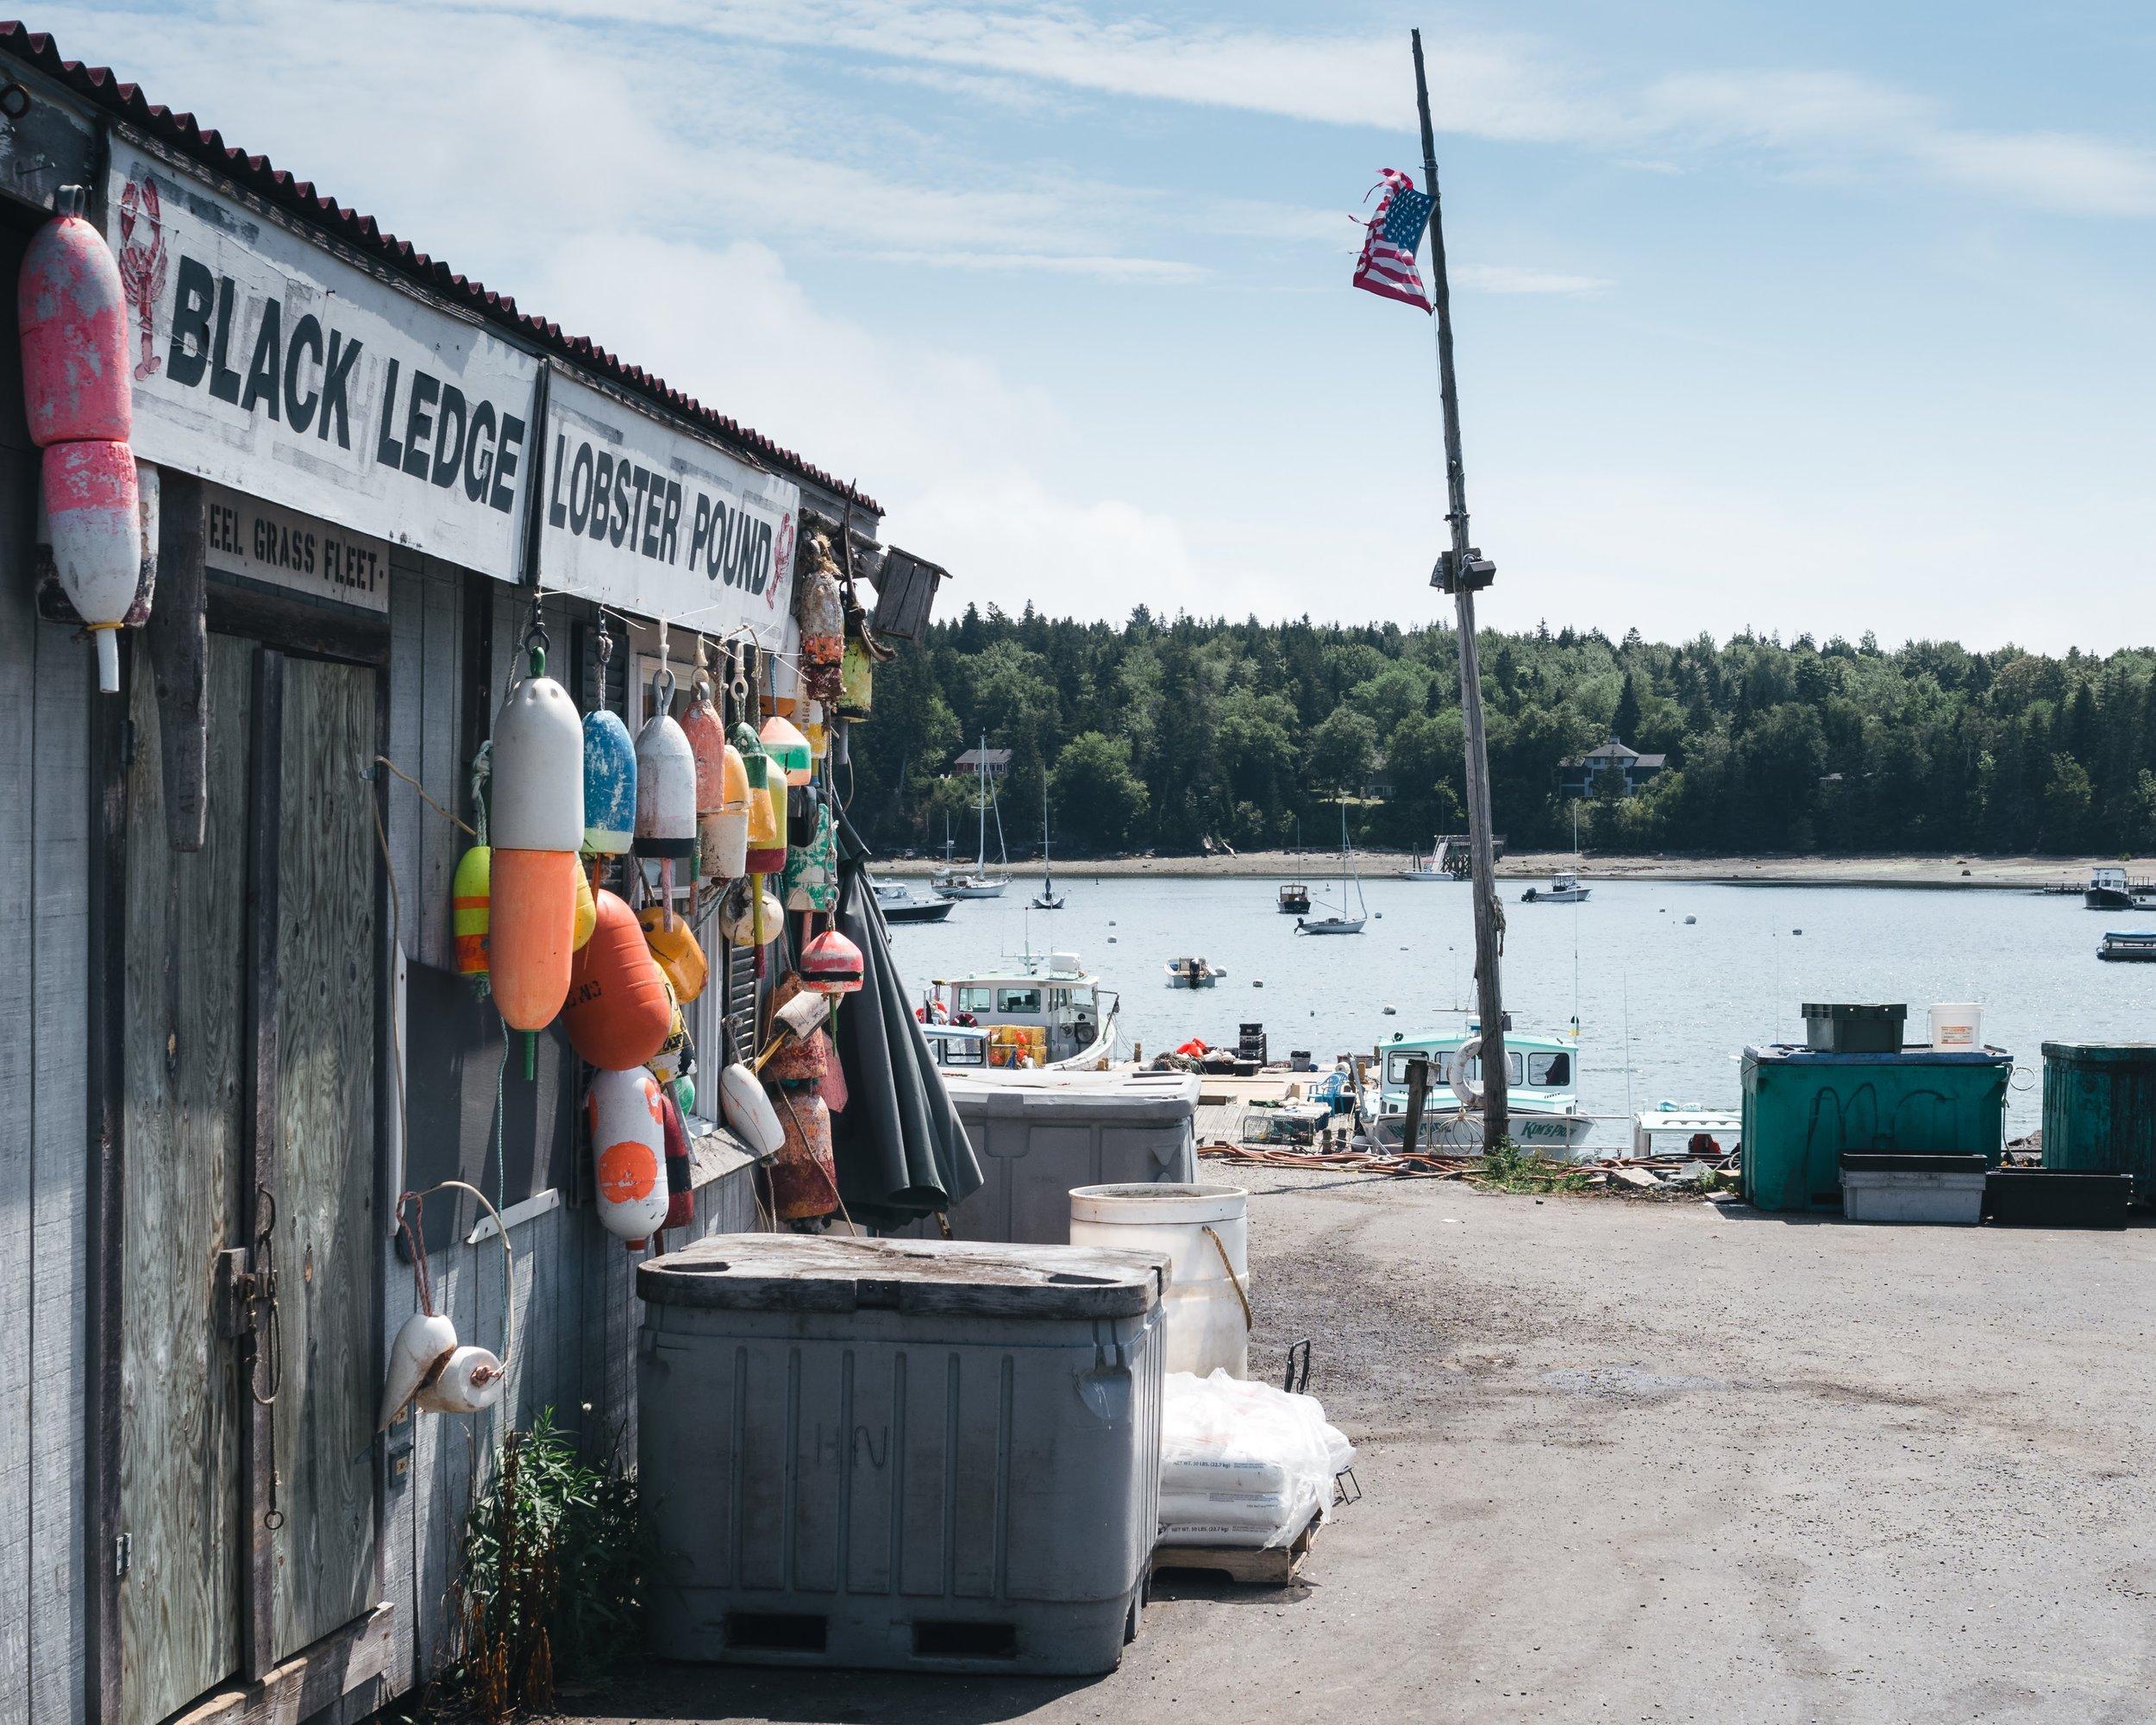 Black Ledge Lobster Pound